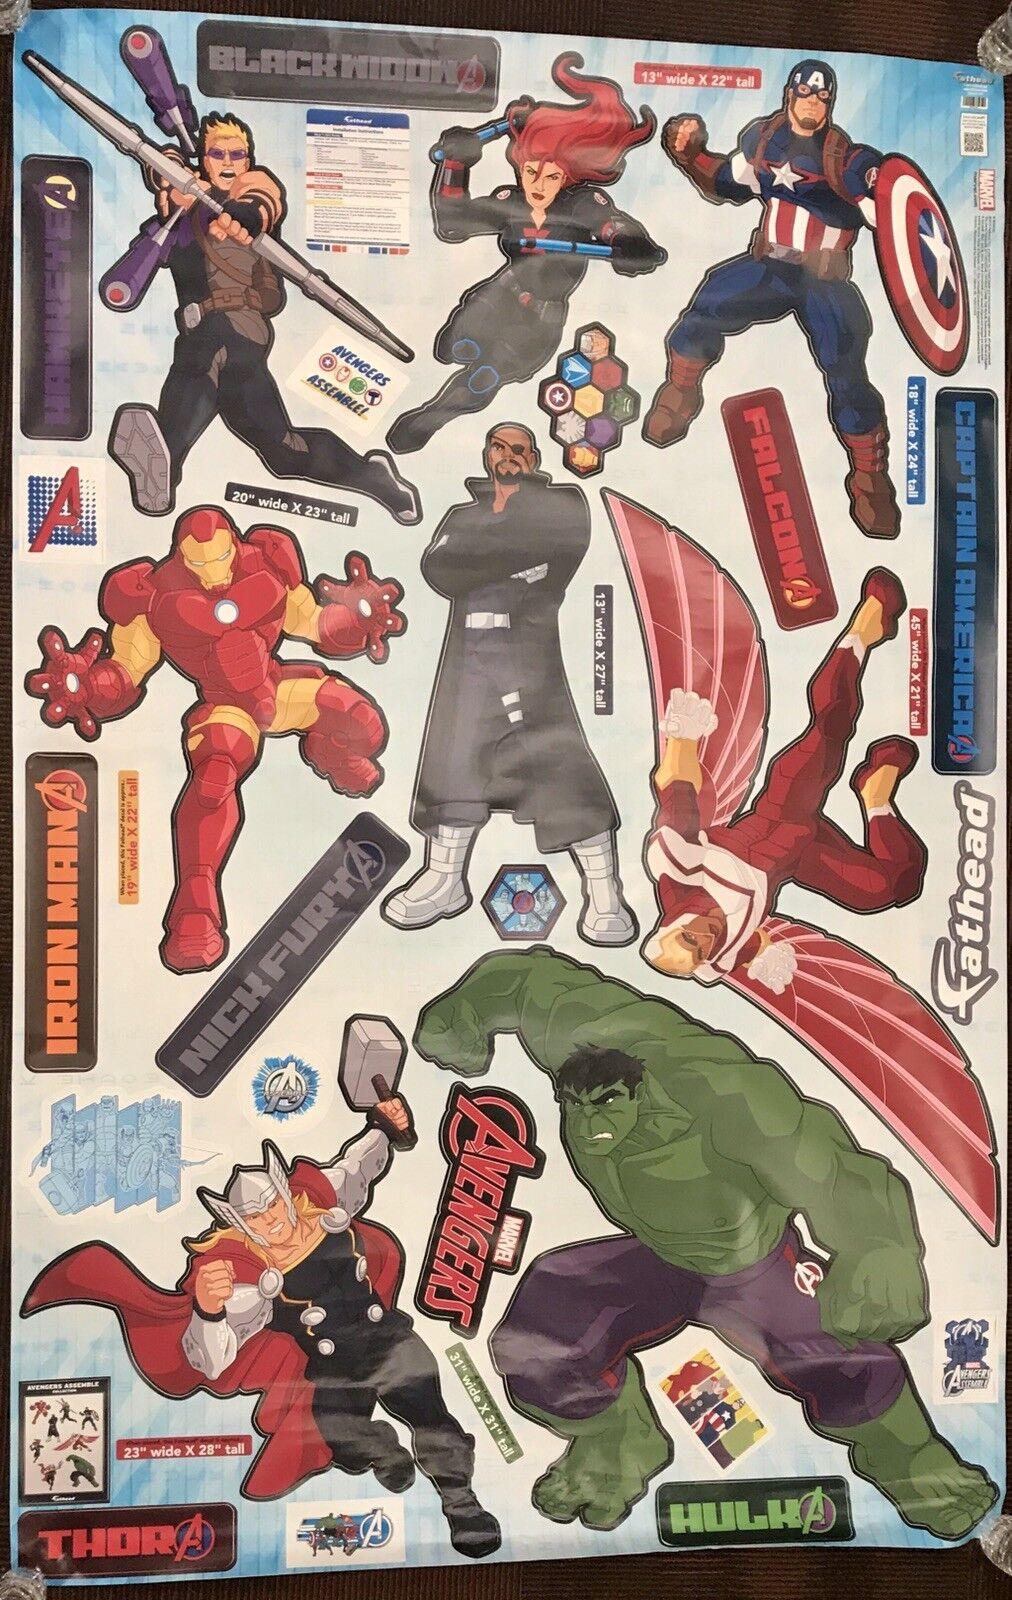 Original FATHEAD Marvel ANIMATED AVENGERS ASSEMBLE Hulk Decal Giant Sticker Set